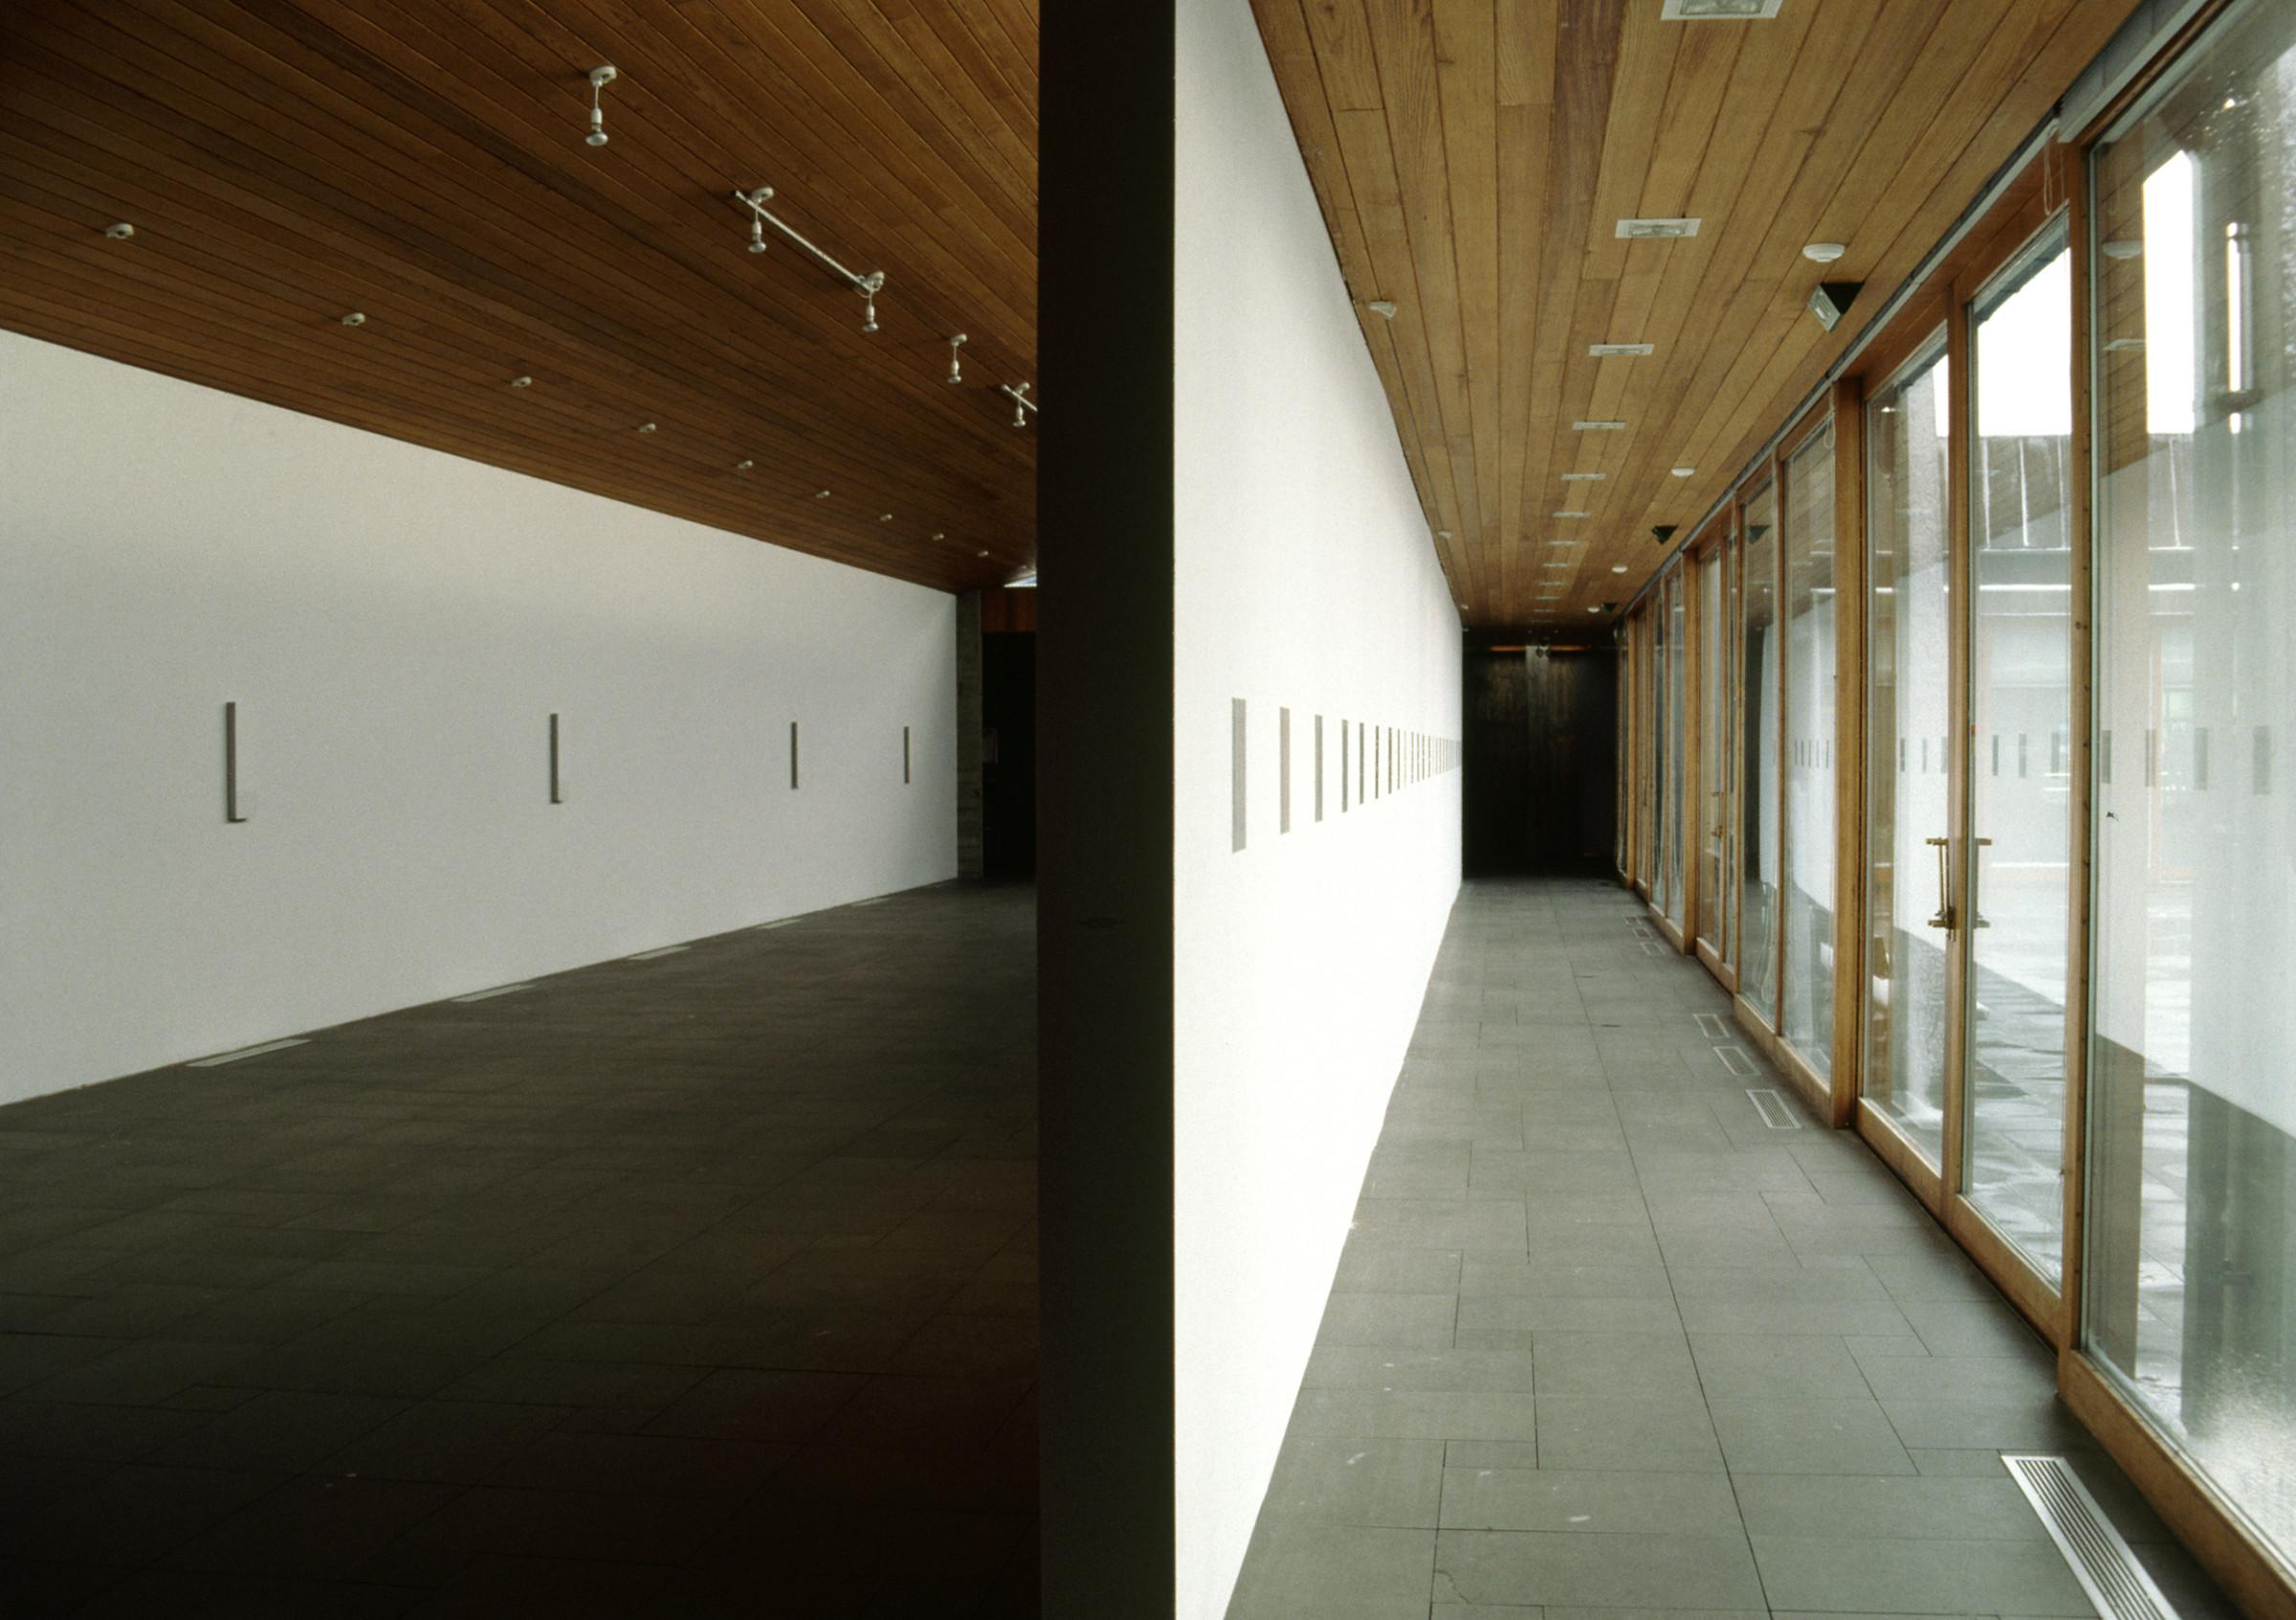 <span class=&#34;link fancybox-details-link&#34;><a href=&#34;/artists/26-ingolfur-arnarsson/works/15495/&#34;>View Detail Page</a></span><div class=&#34;artist&#34;><strong>INGÓLFUR ARNARSSON</strong></div> <div class=&#34;title&#34;><em></em>, 1996</div> <div class=&#34;medium&#34;>exhibition view at Listasafn Reykjavikur - Kjarvalsstaðir</div><div class=&#34;copyright_line&#34;>Copyright The Artist</div>